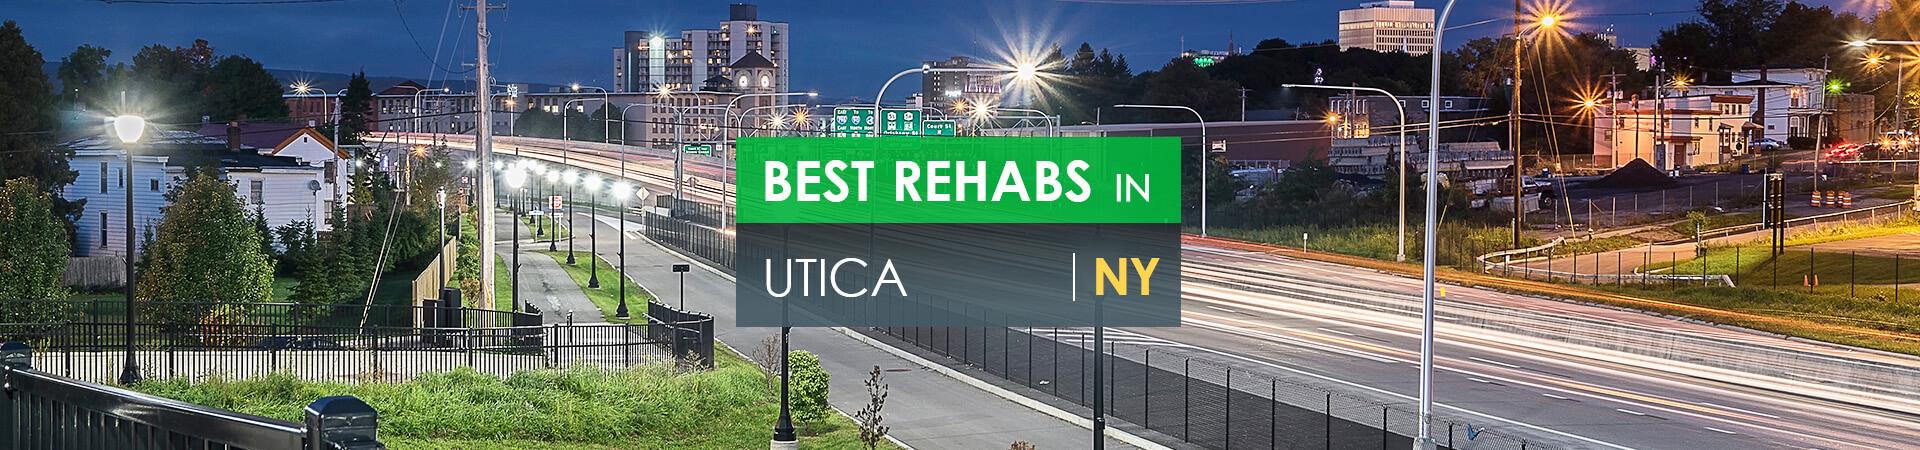 Best rehabs in Utica, NY